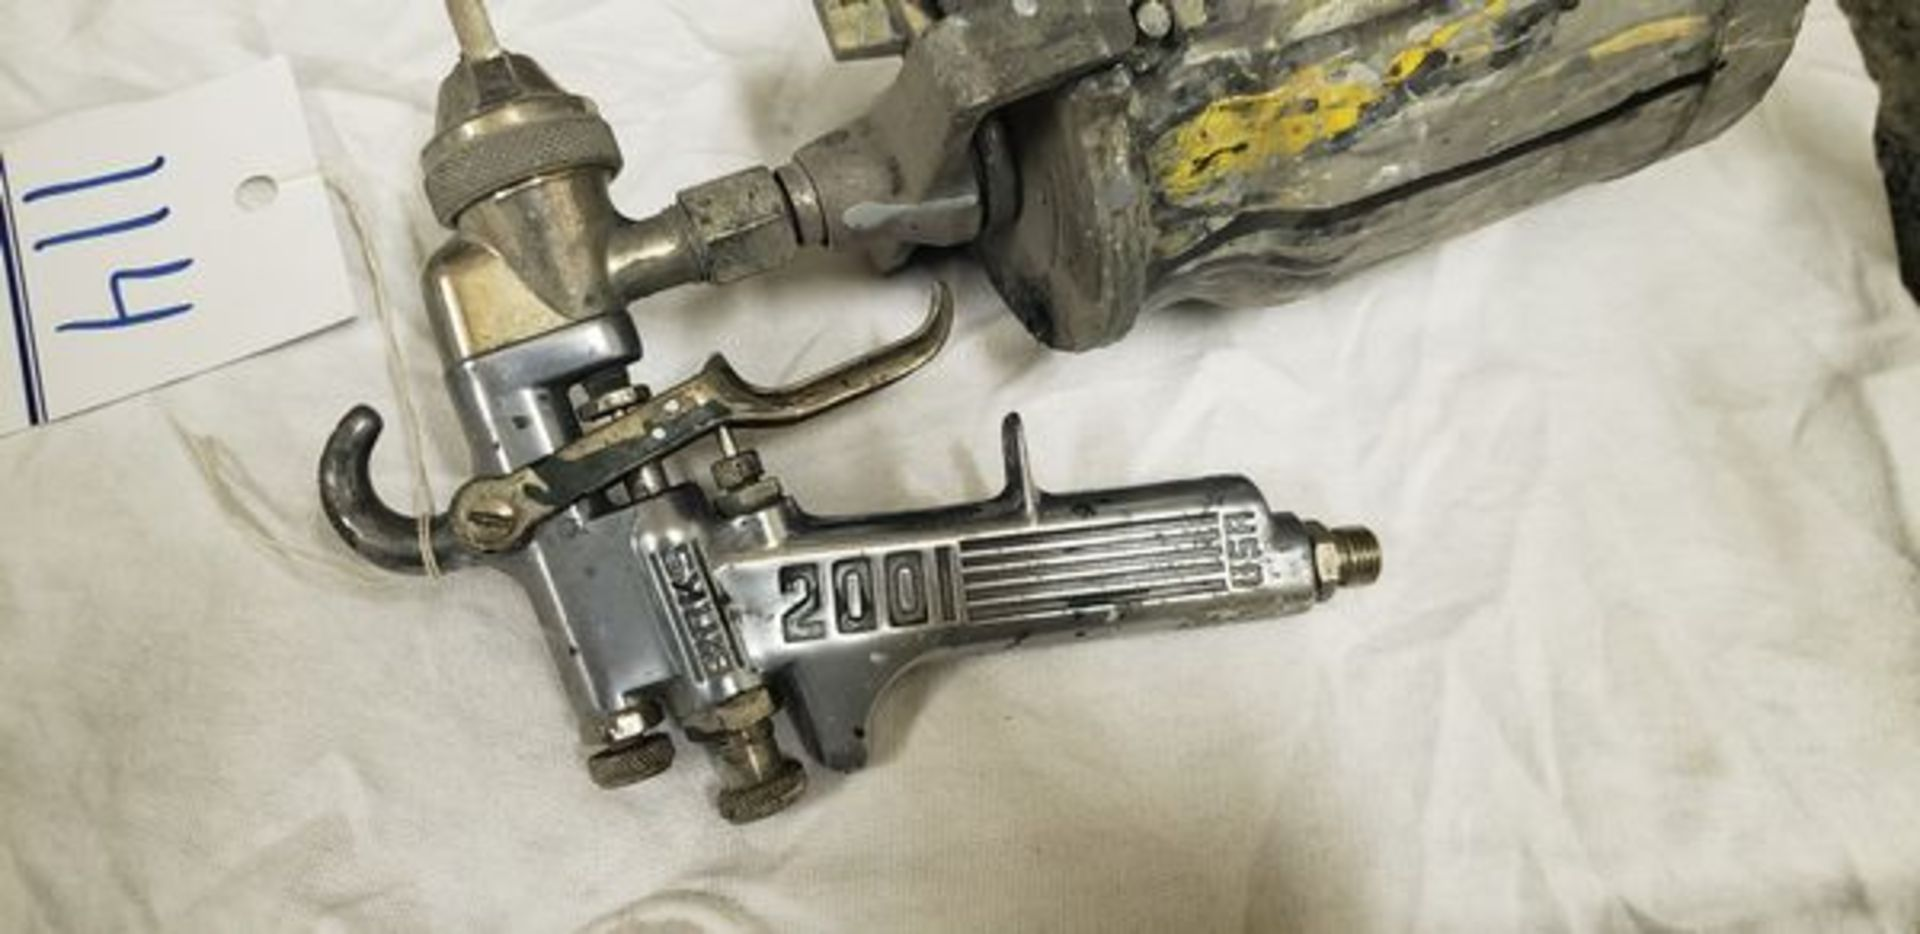 BINKS 2001 SPRAY GUN - Image 4 of 4